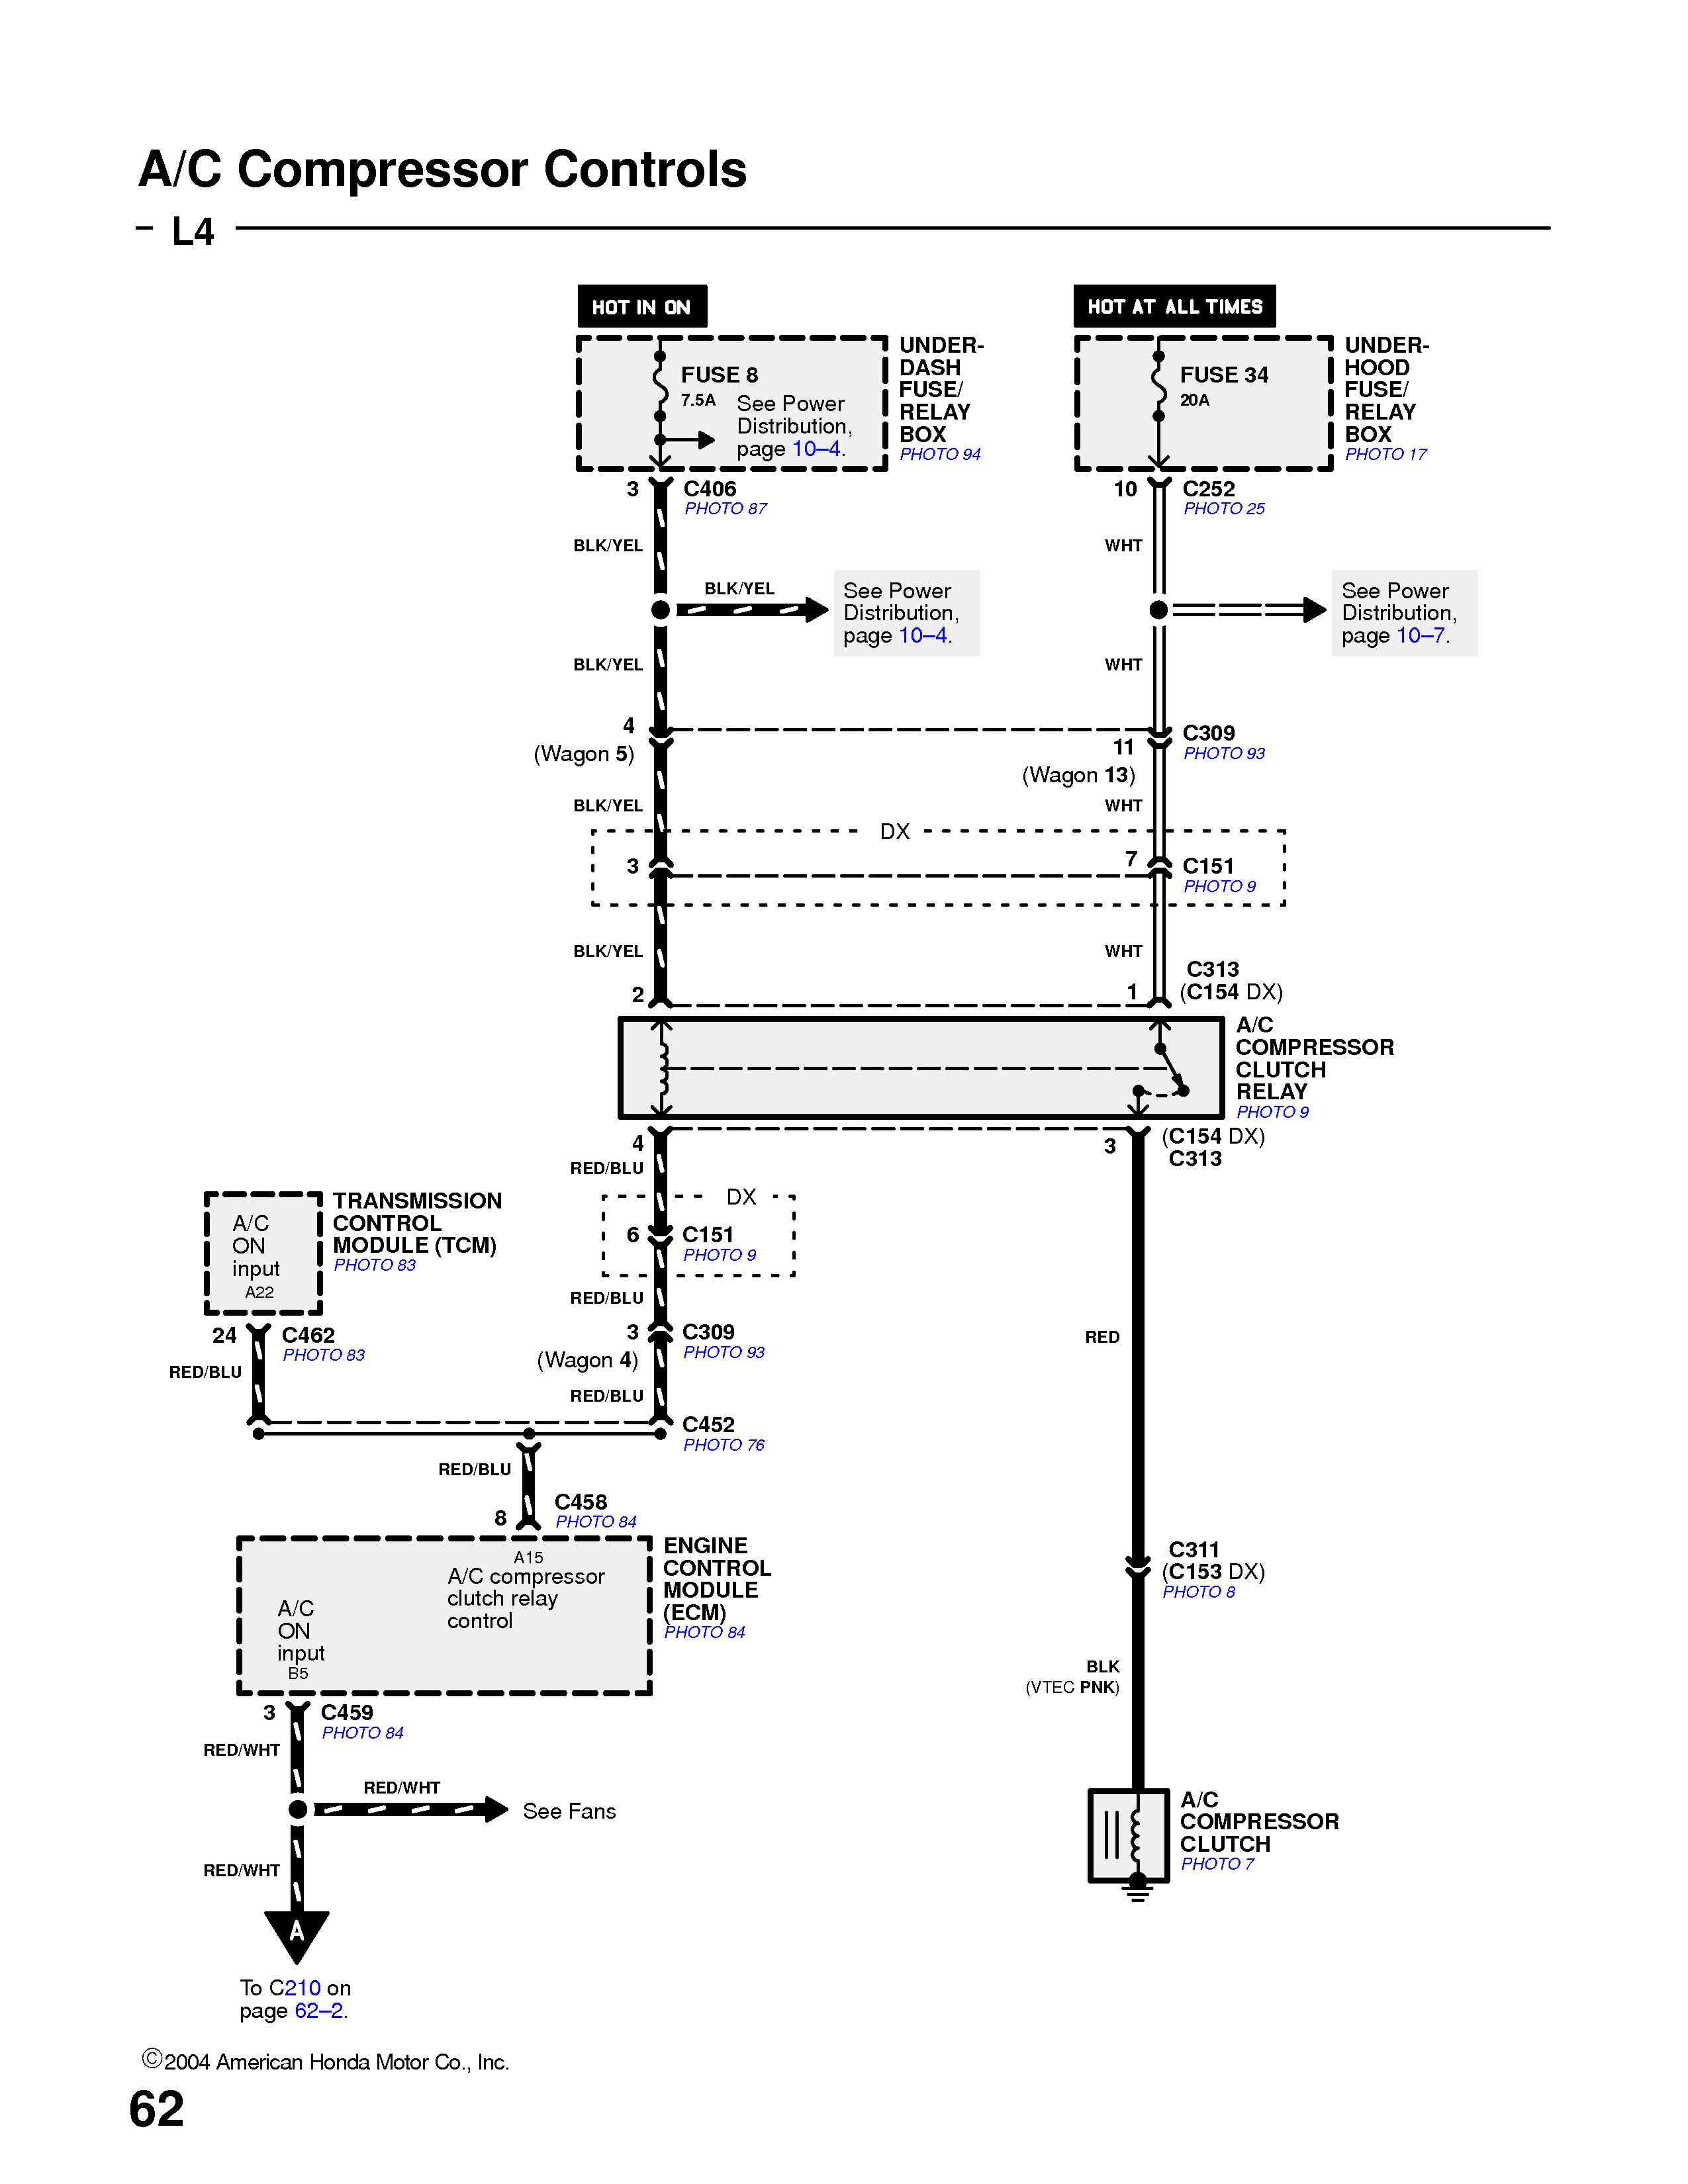 DIAGRAM] 1985 Honda Accord Axle Diagram Wiring Schematic FULL Version HD  Quality Wiring Schematic - WALDIAGRAMACAO.LANCIAECOCHIC.ITLanciaecochic.it